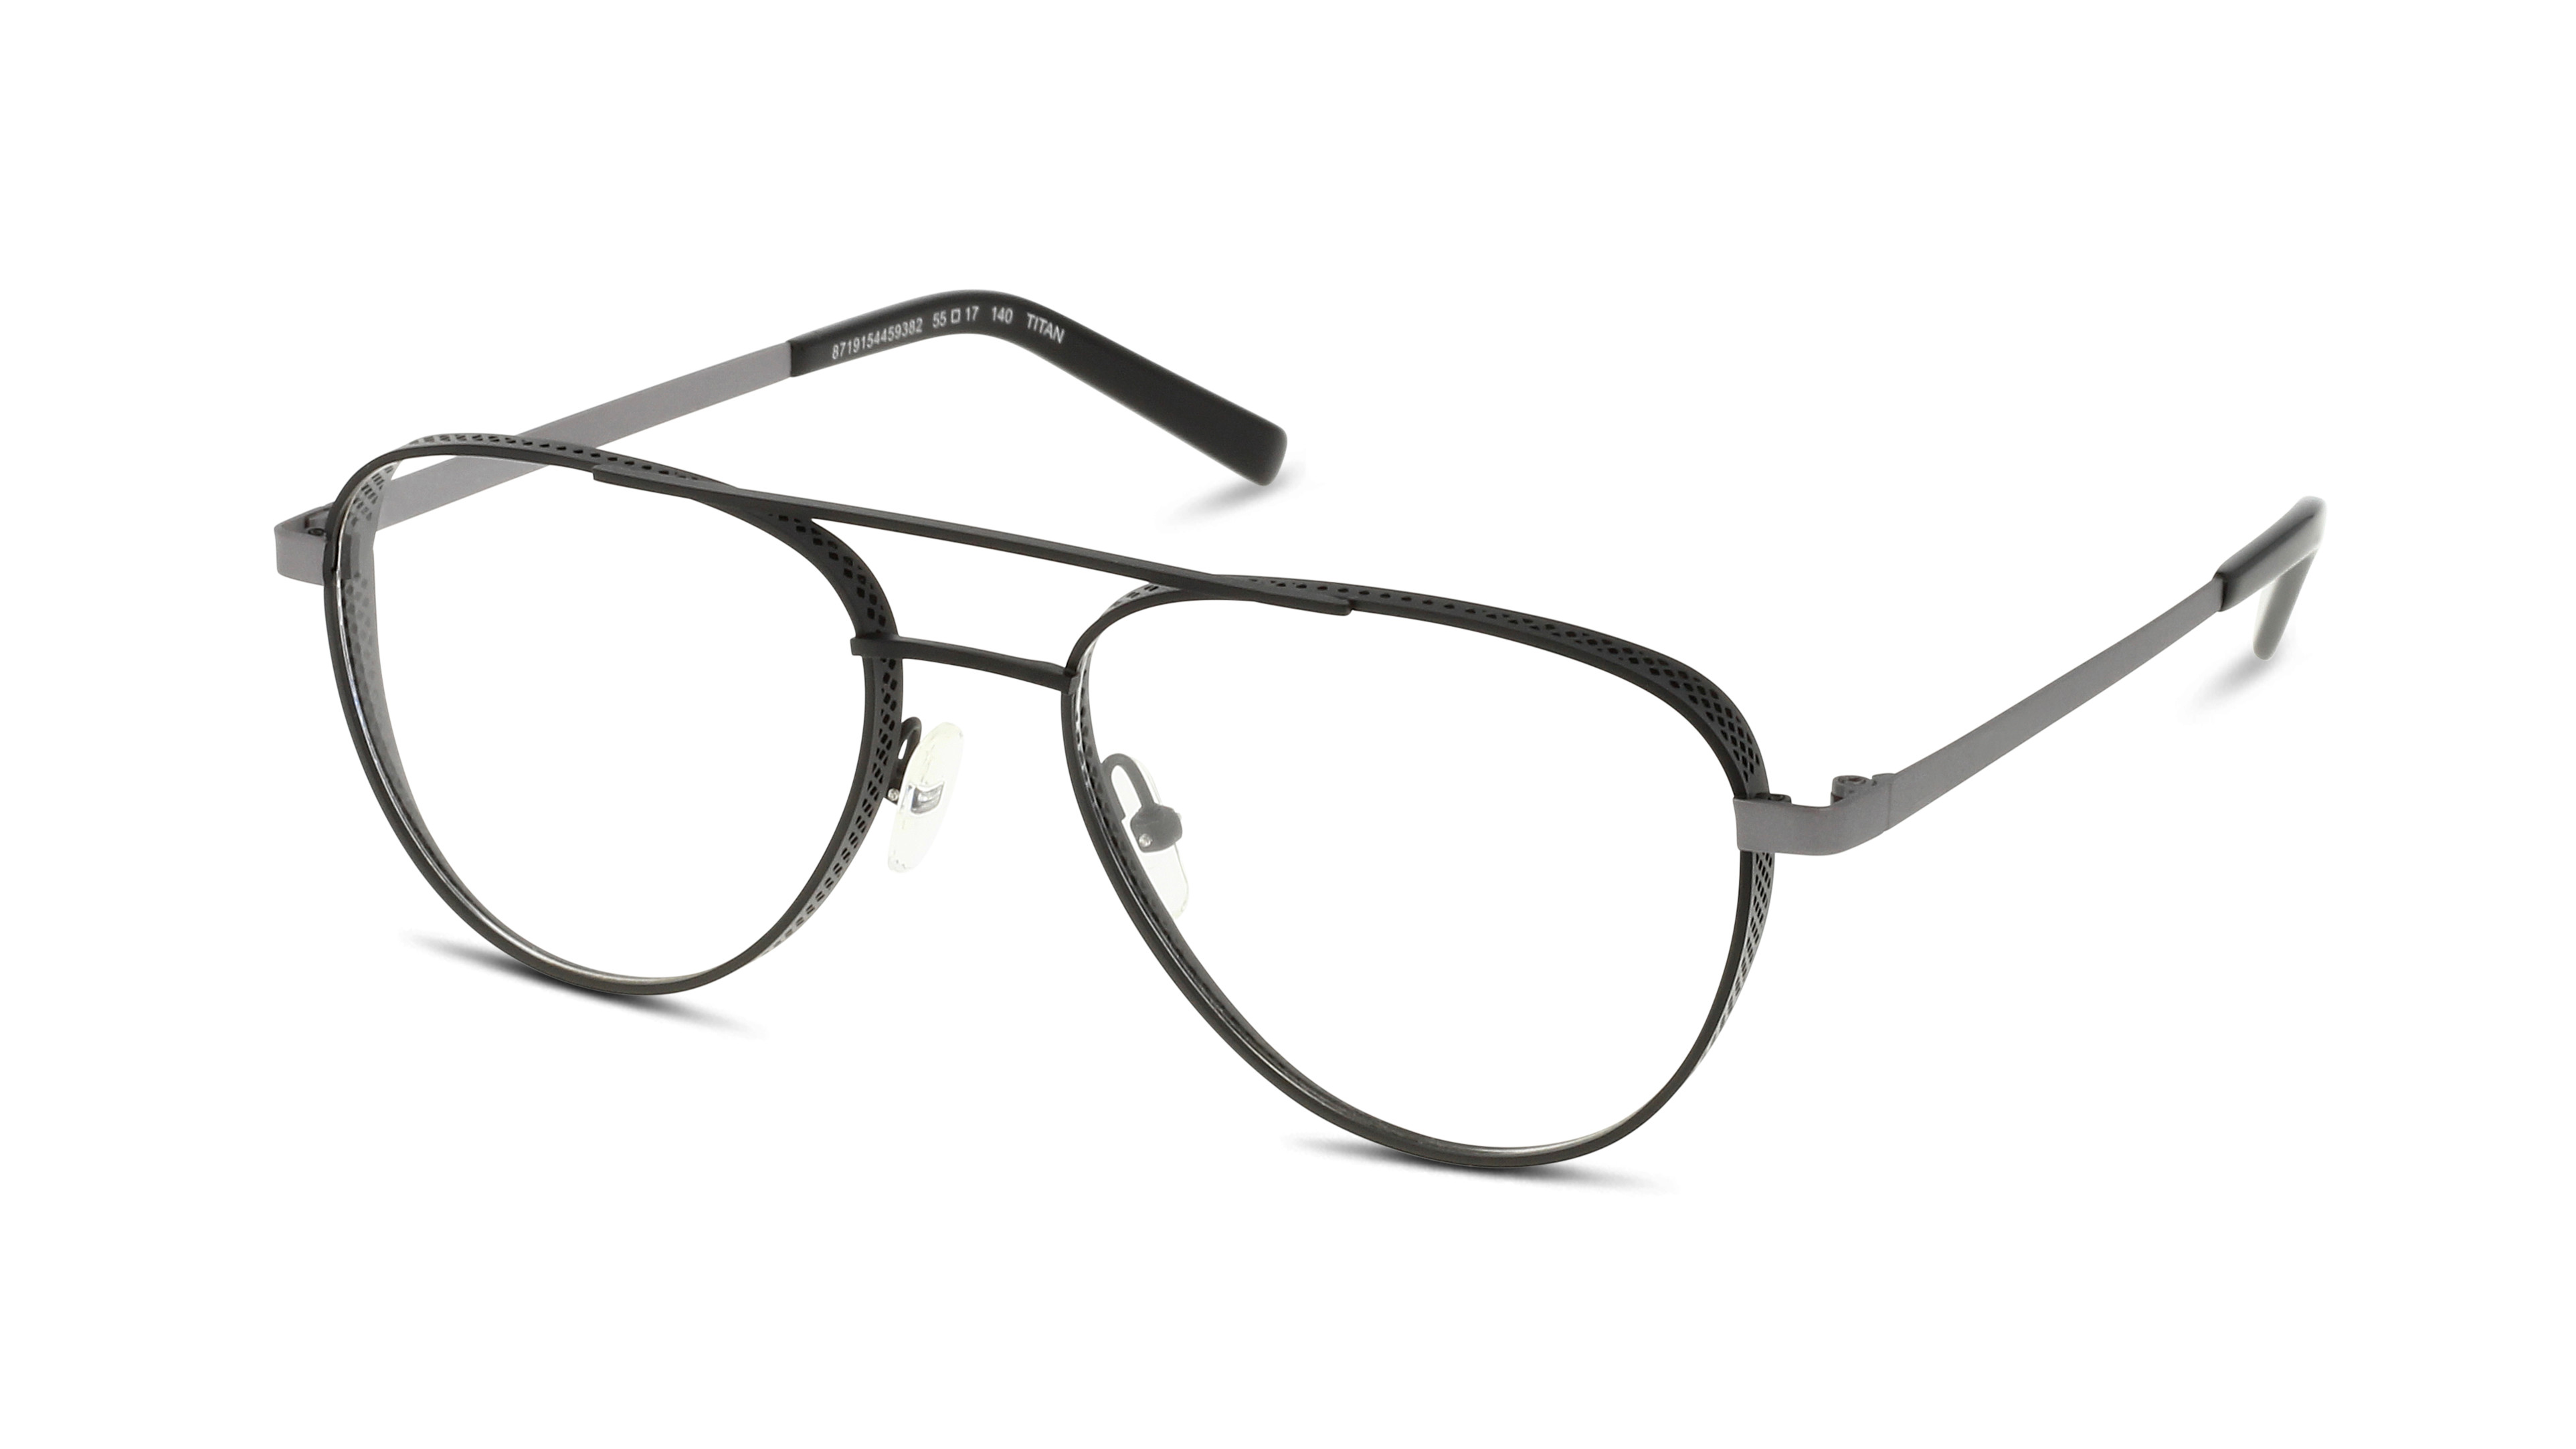 8719154621642-angle-03-fuzion-fuim01-Eyewear-black-grey